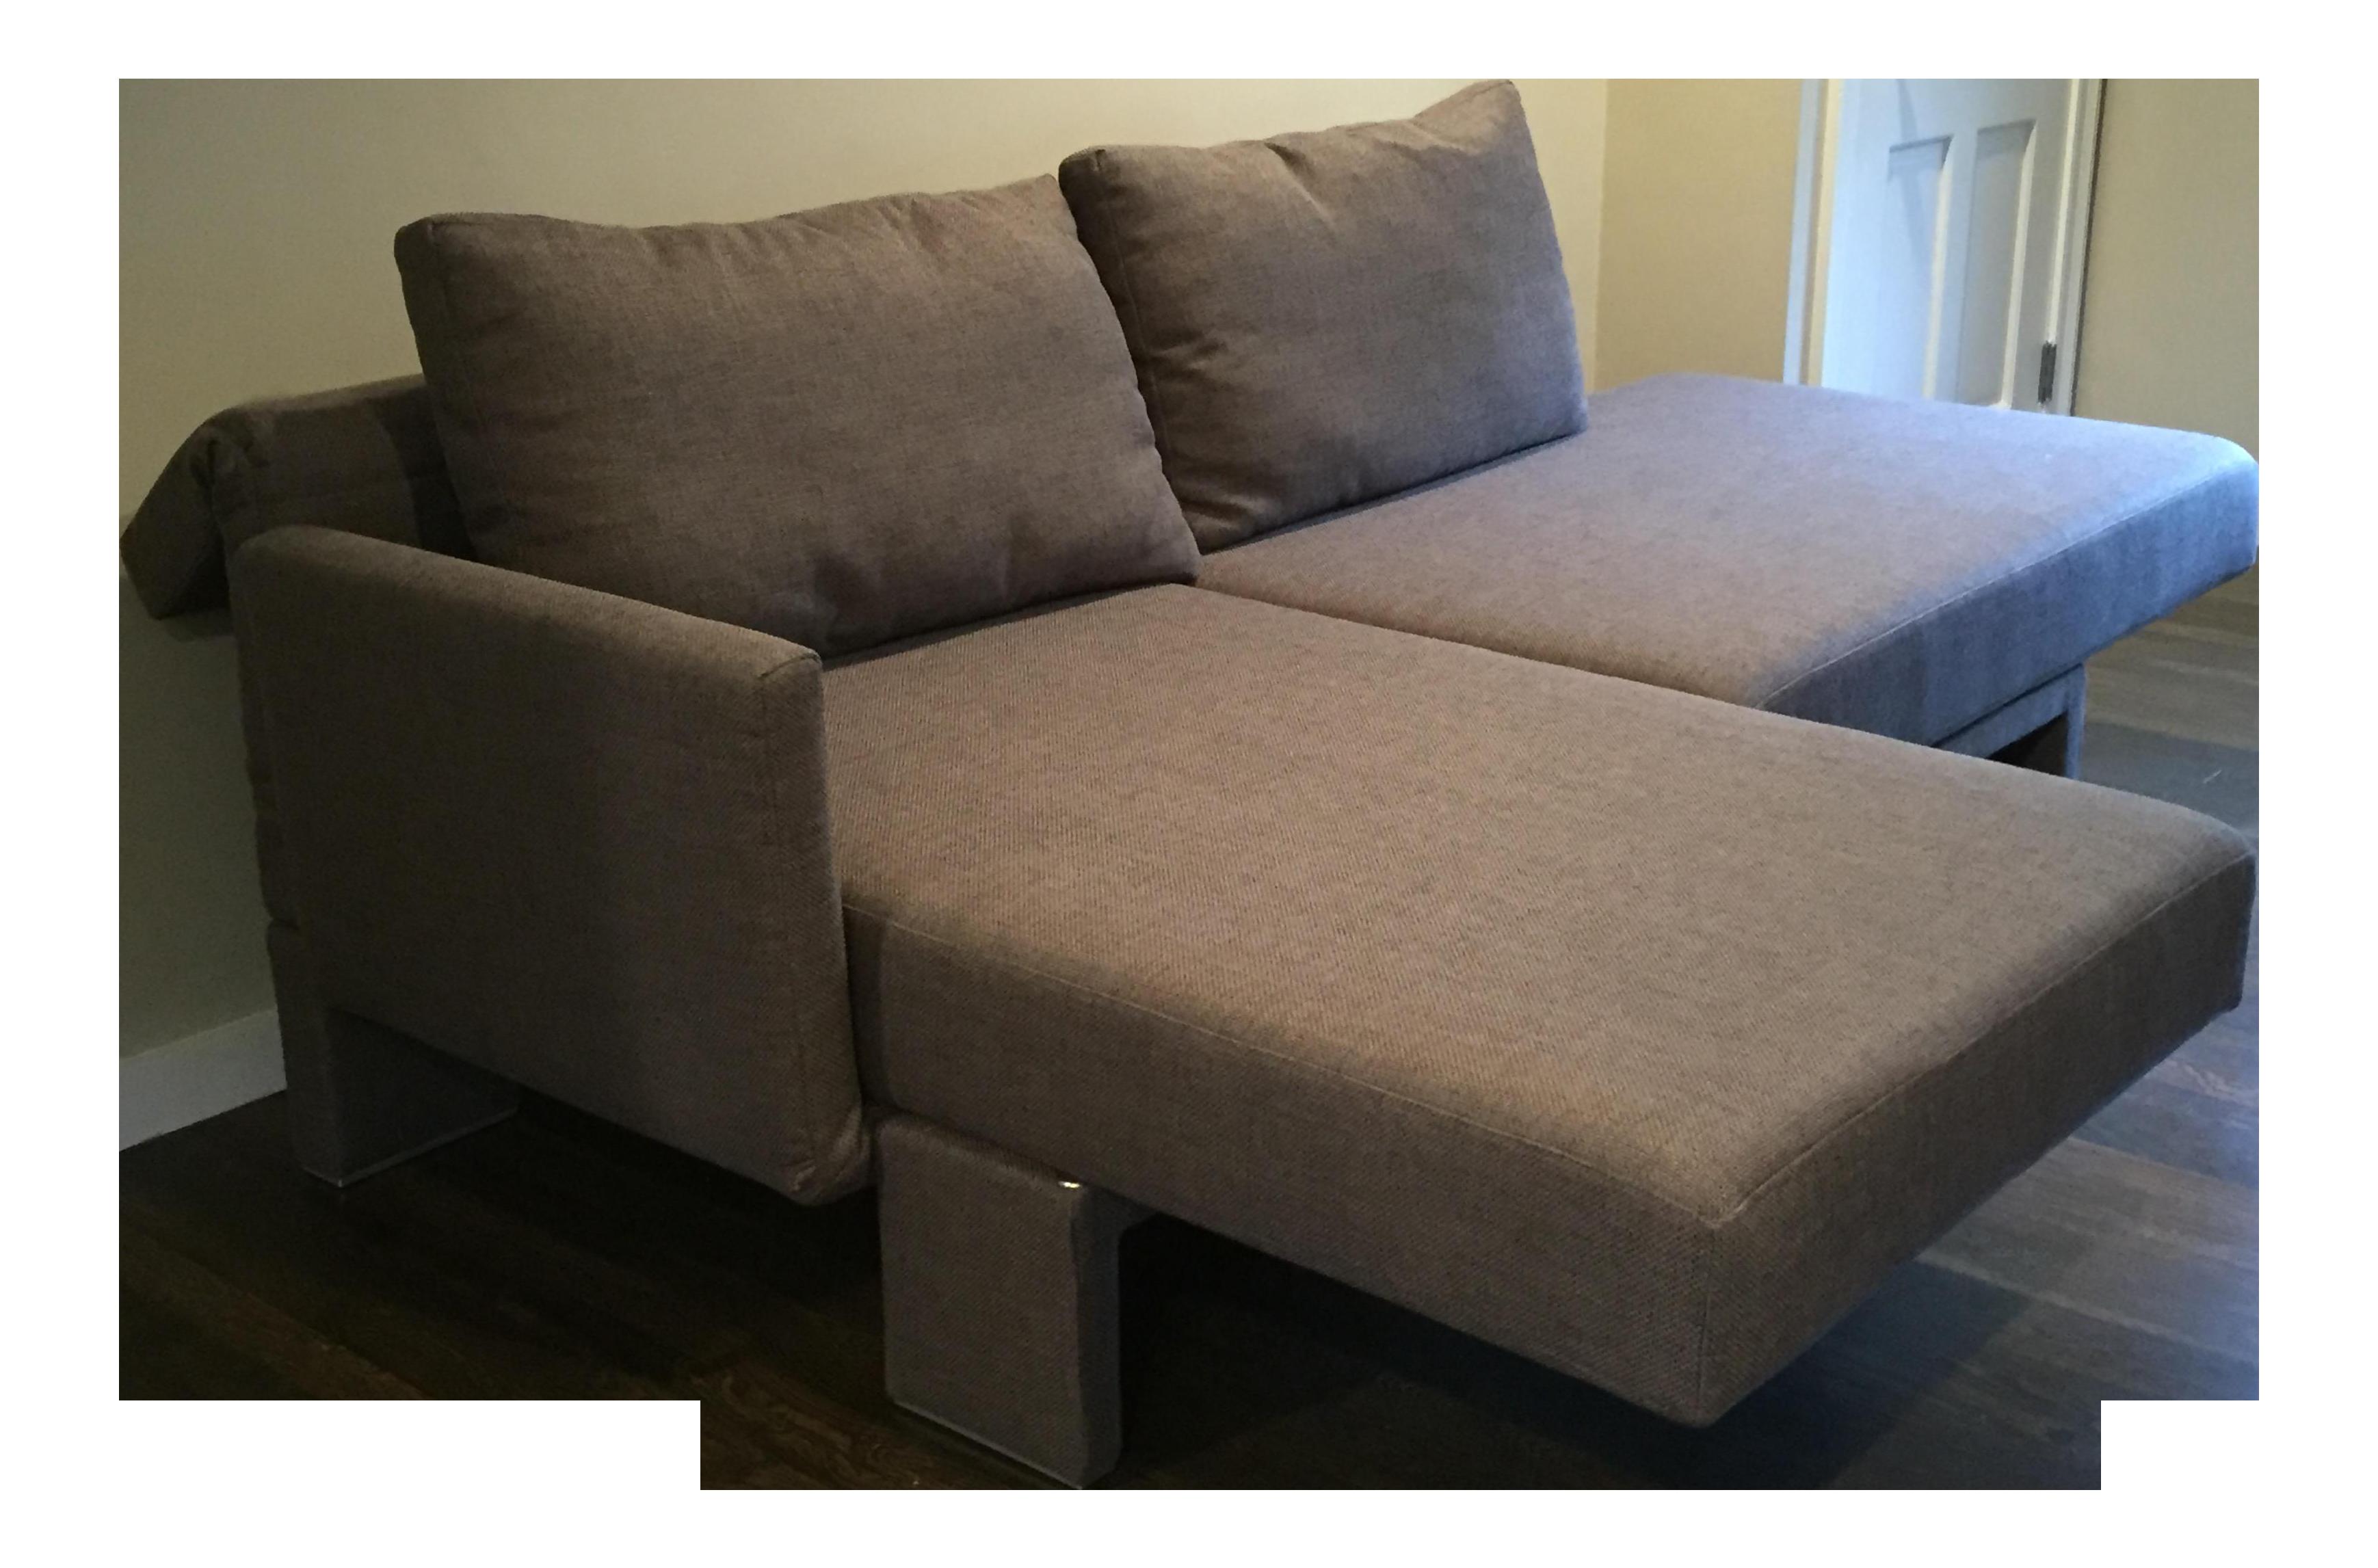 Franz Fertig Sofas franz fertig sectional sofa chairish